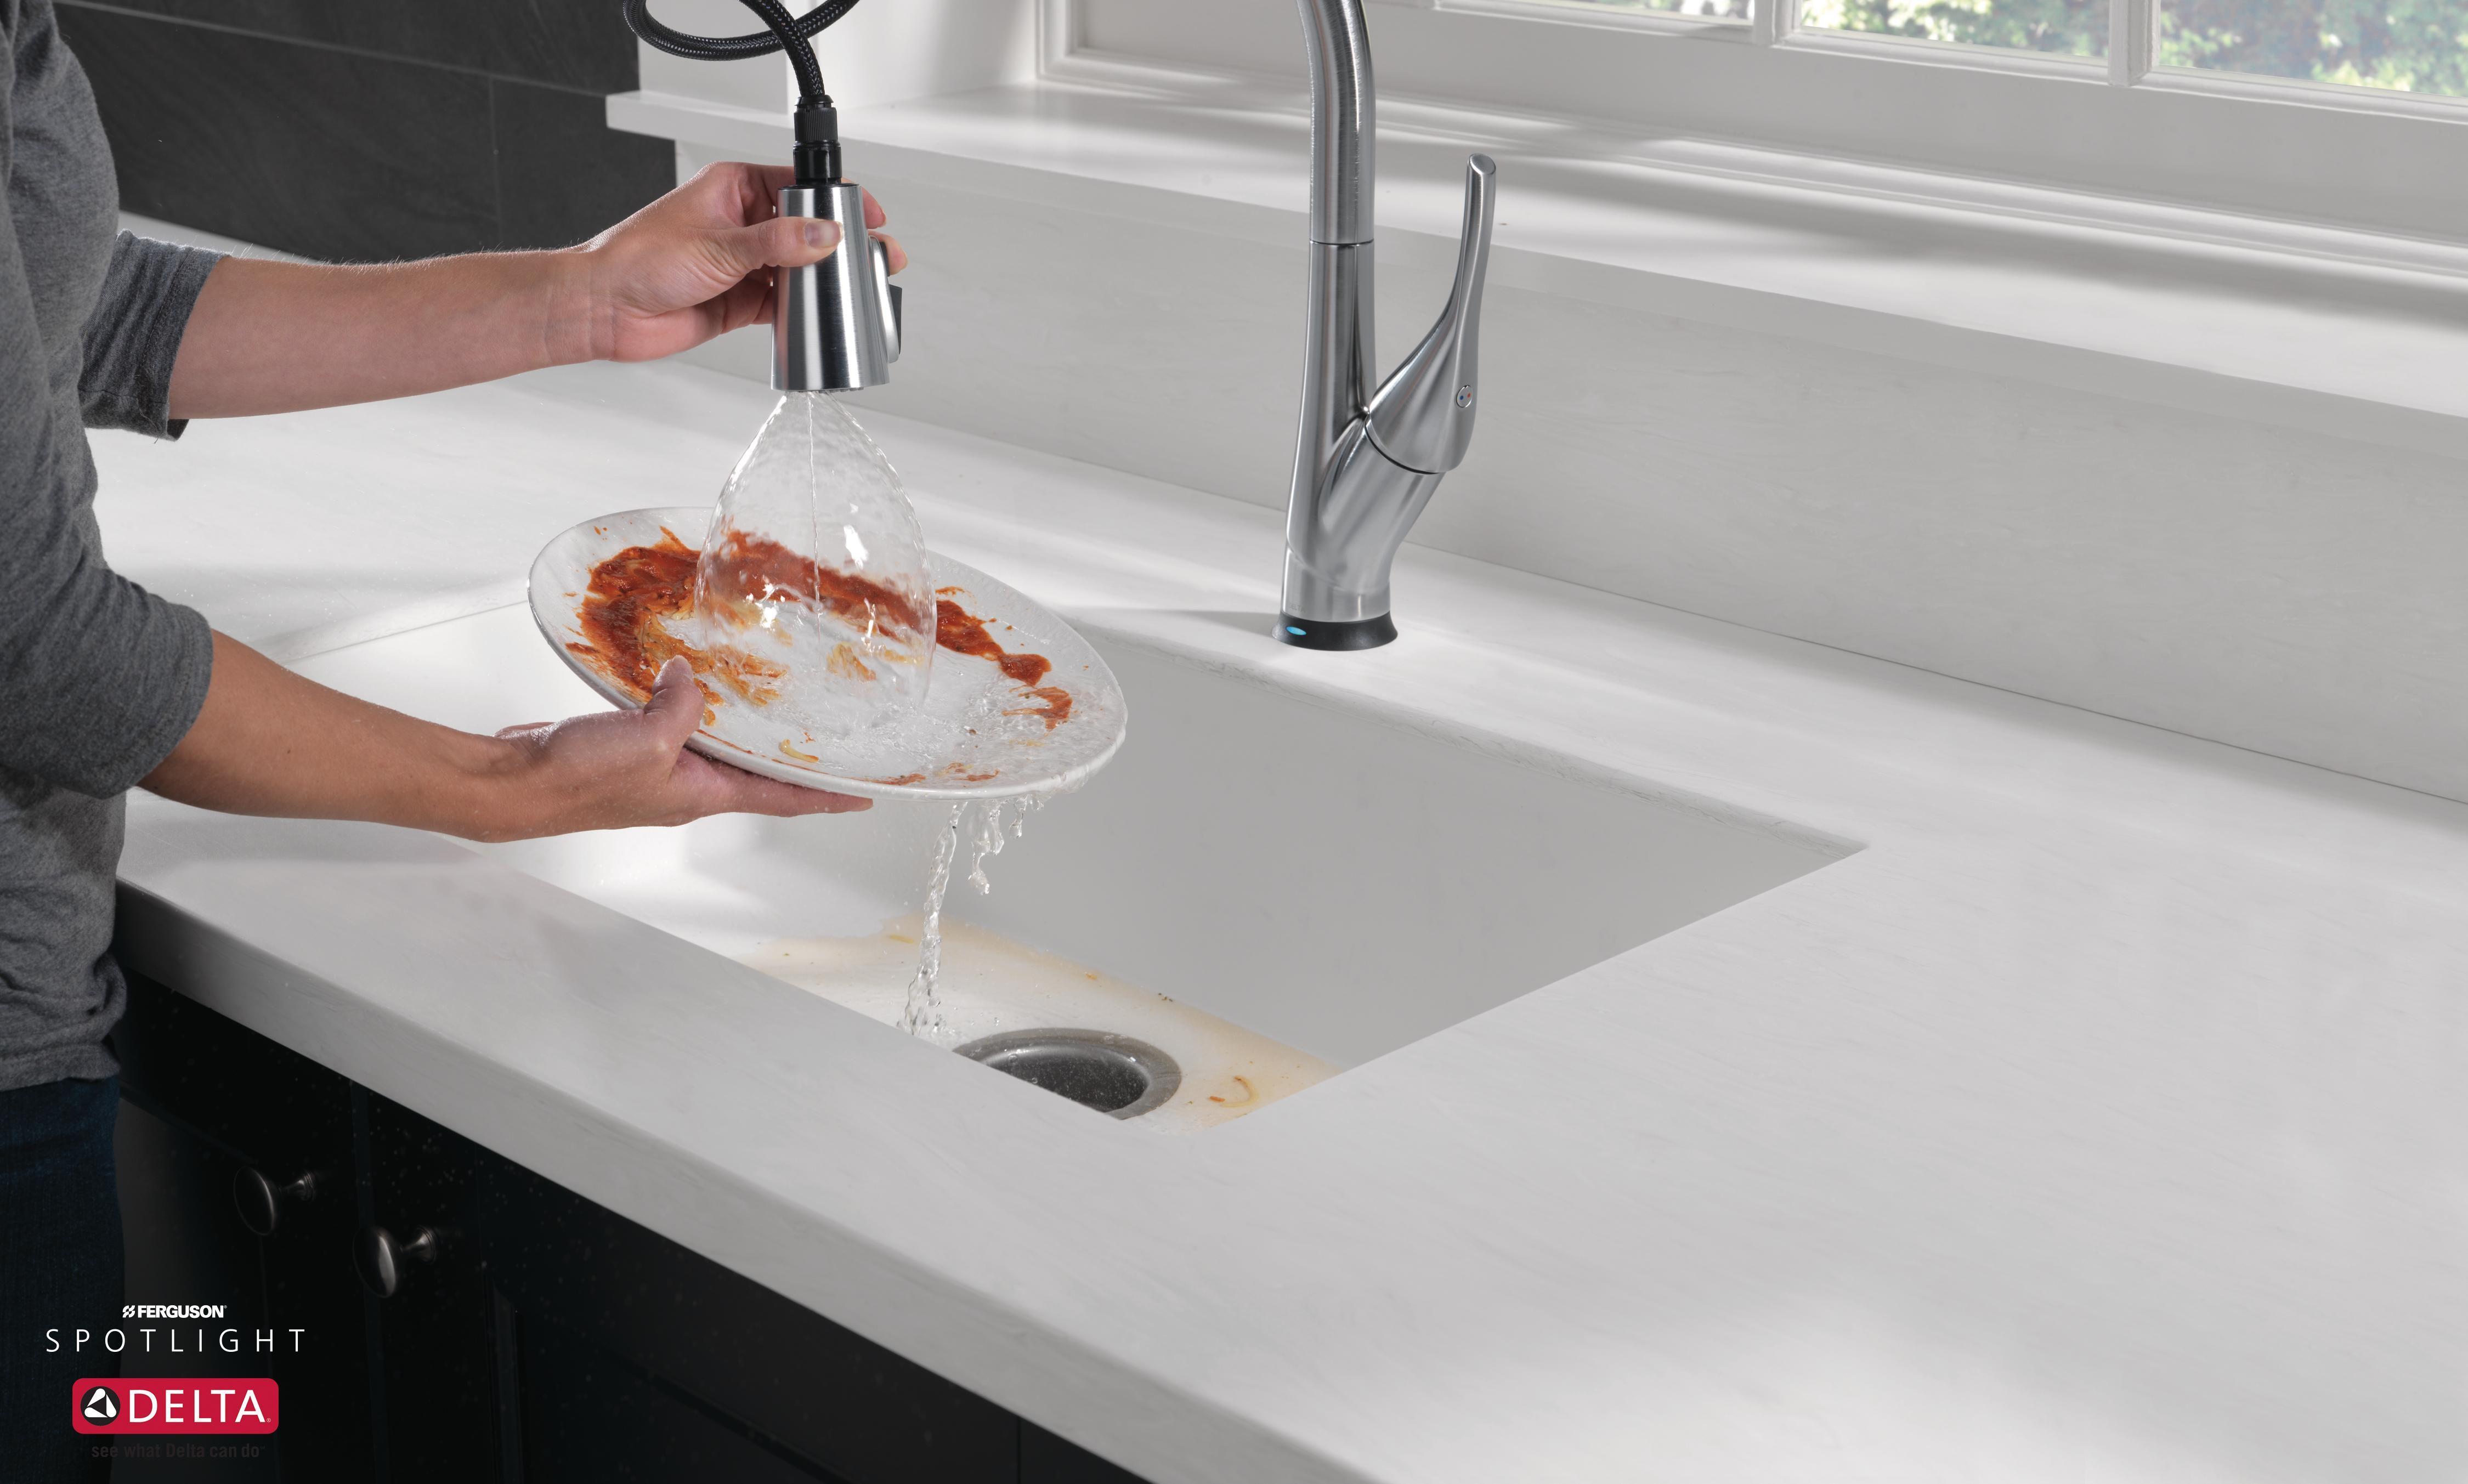 delta pull down kitchen faucet featuring shieldspray technology rh pinterest com